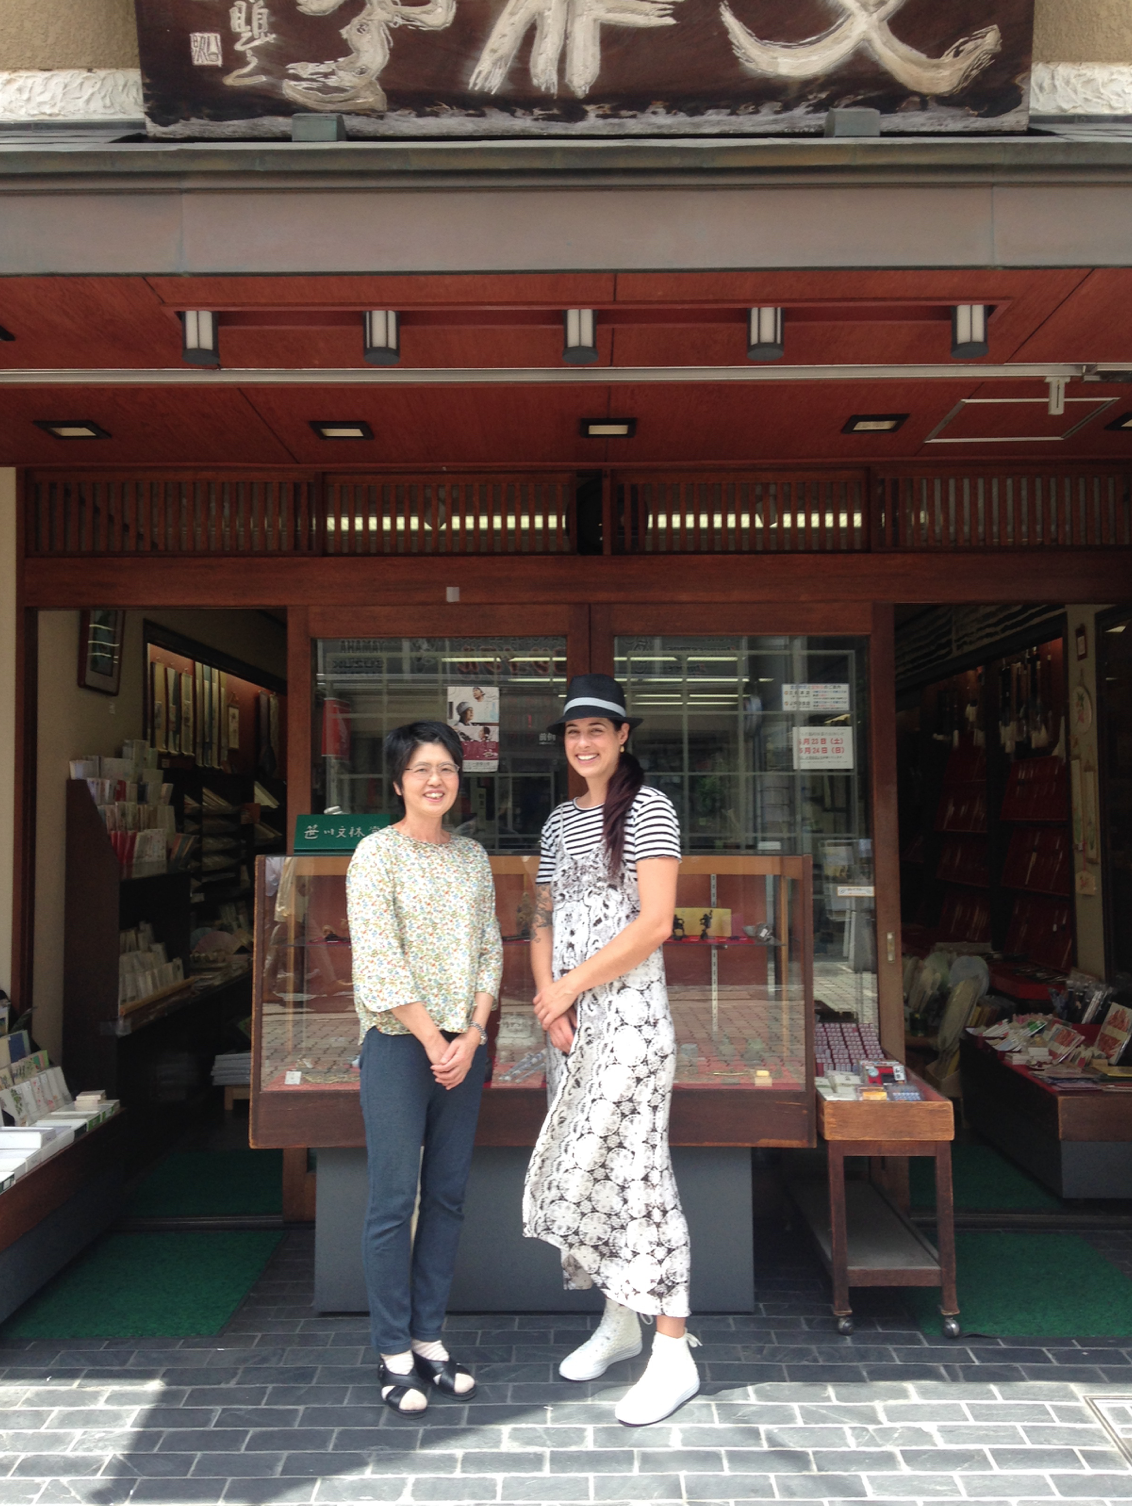 Sasakawa Bunrindo- One of the oldest Shodo (Japanese Calligraphy) shops in Japan.